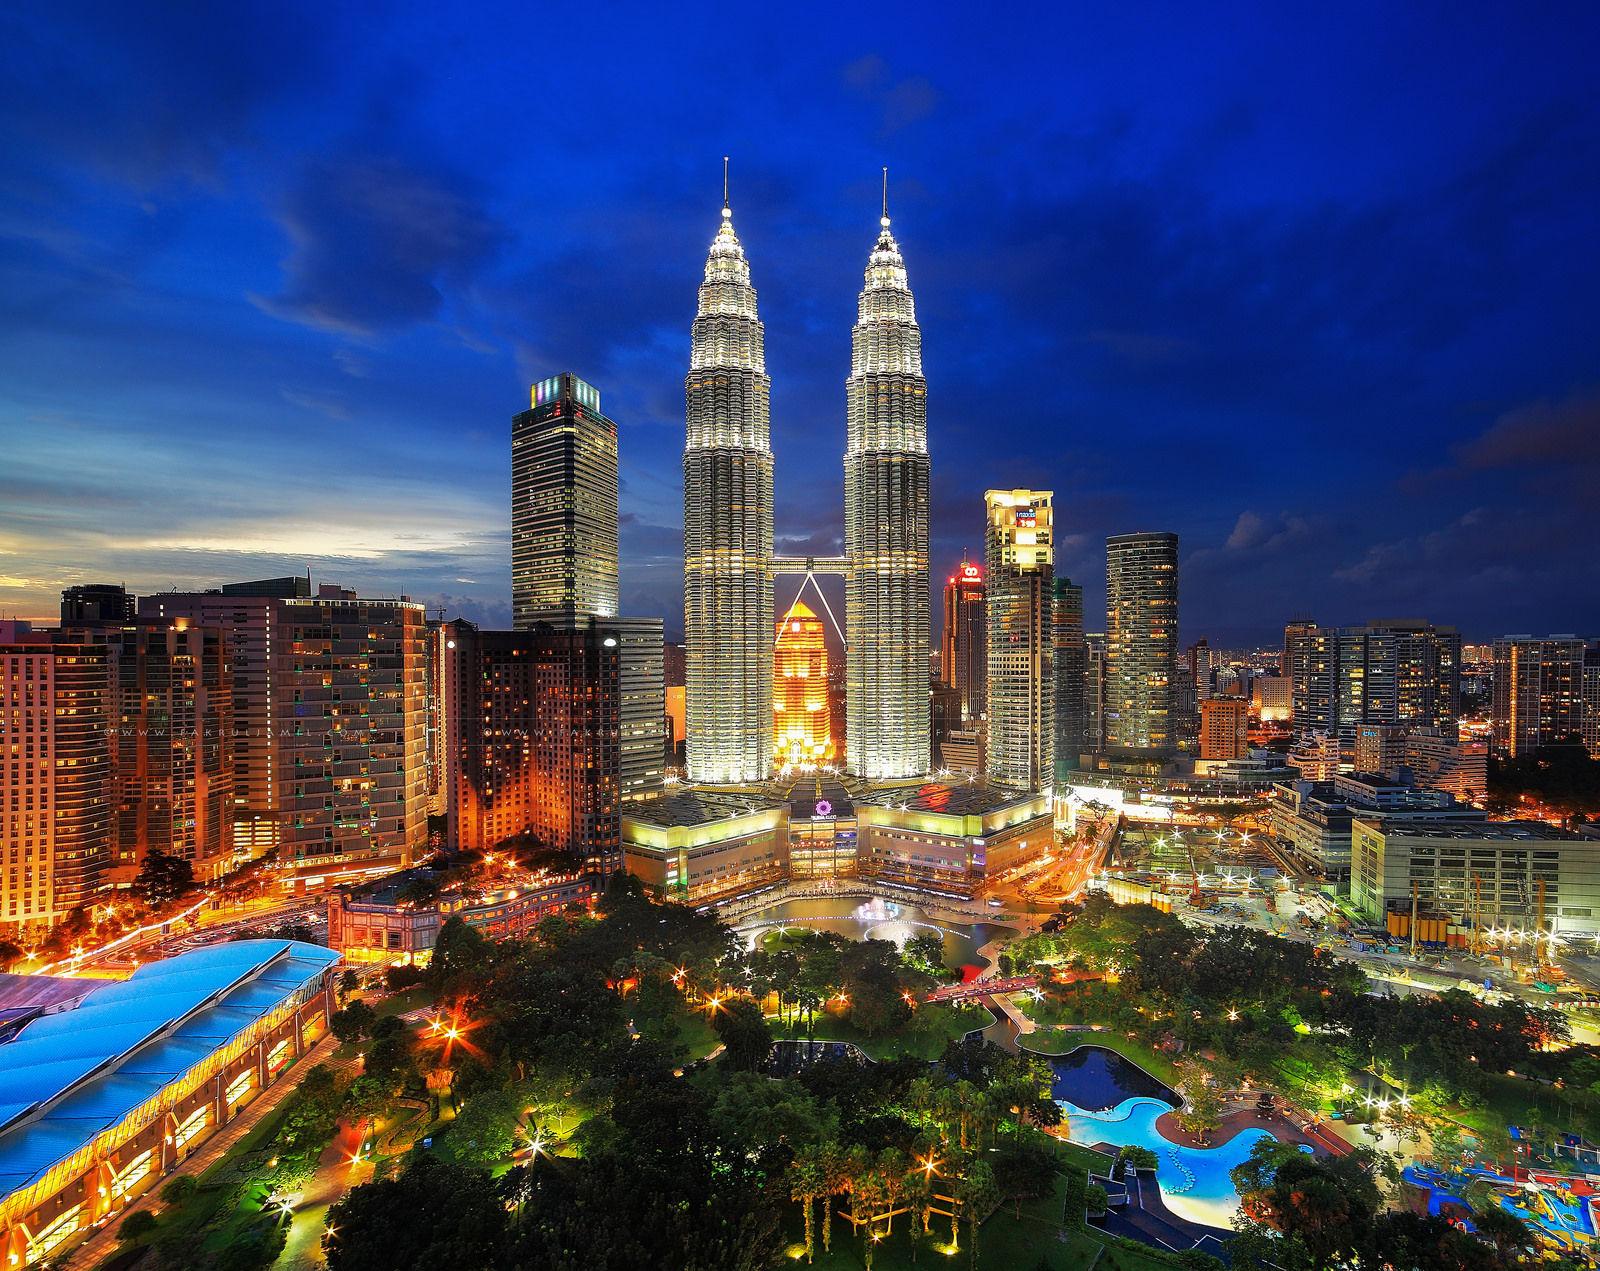 ¿A qué país pertenece Kuala Lumpur?